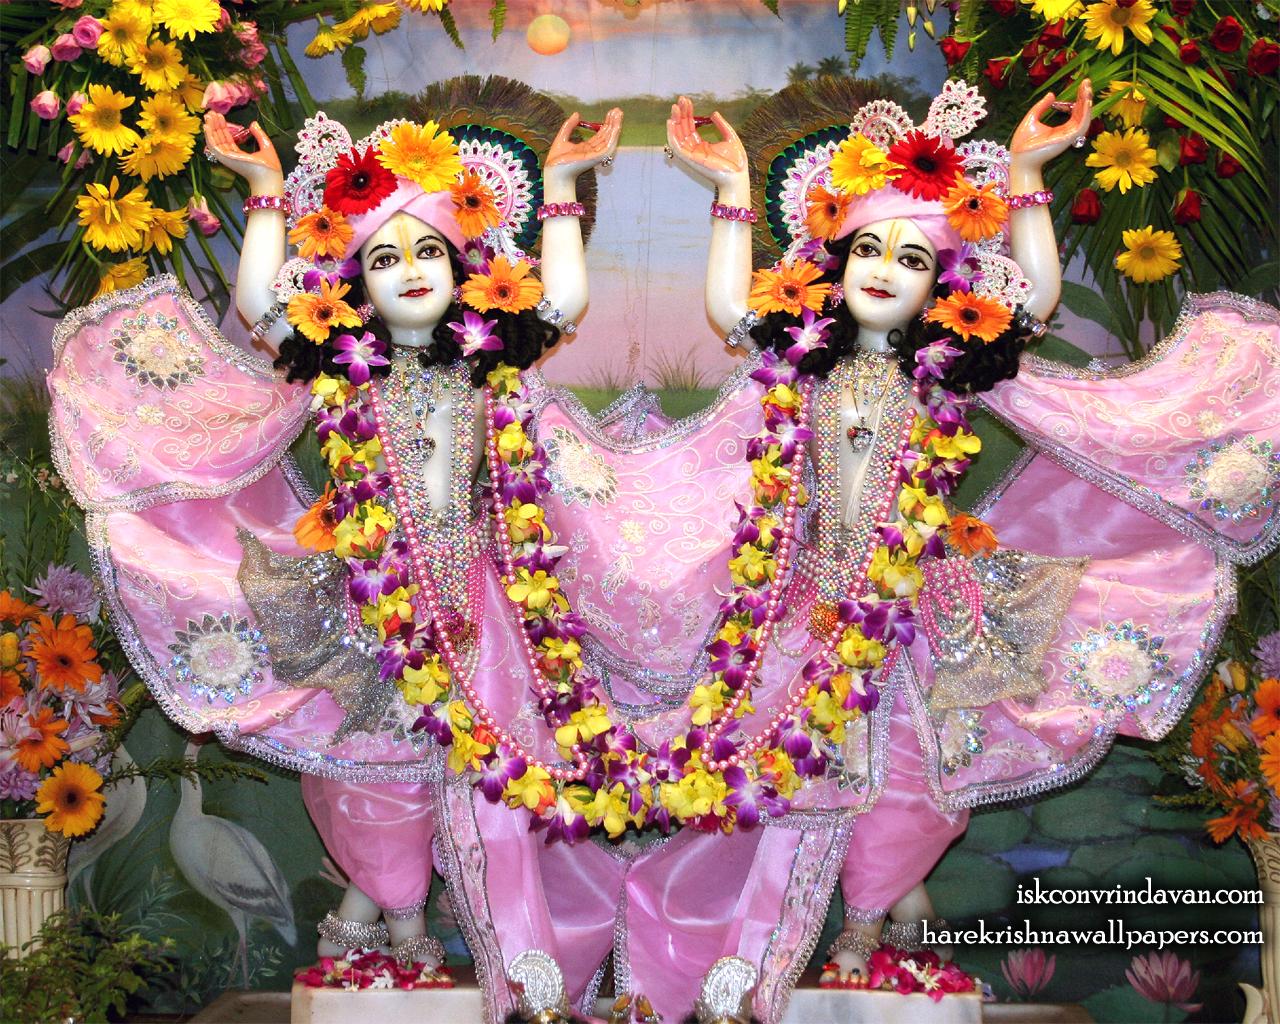 Sri Sri Gaura Nitai Wallpaper (090) Size 1280x1024 Download